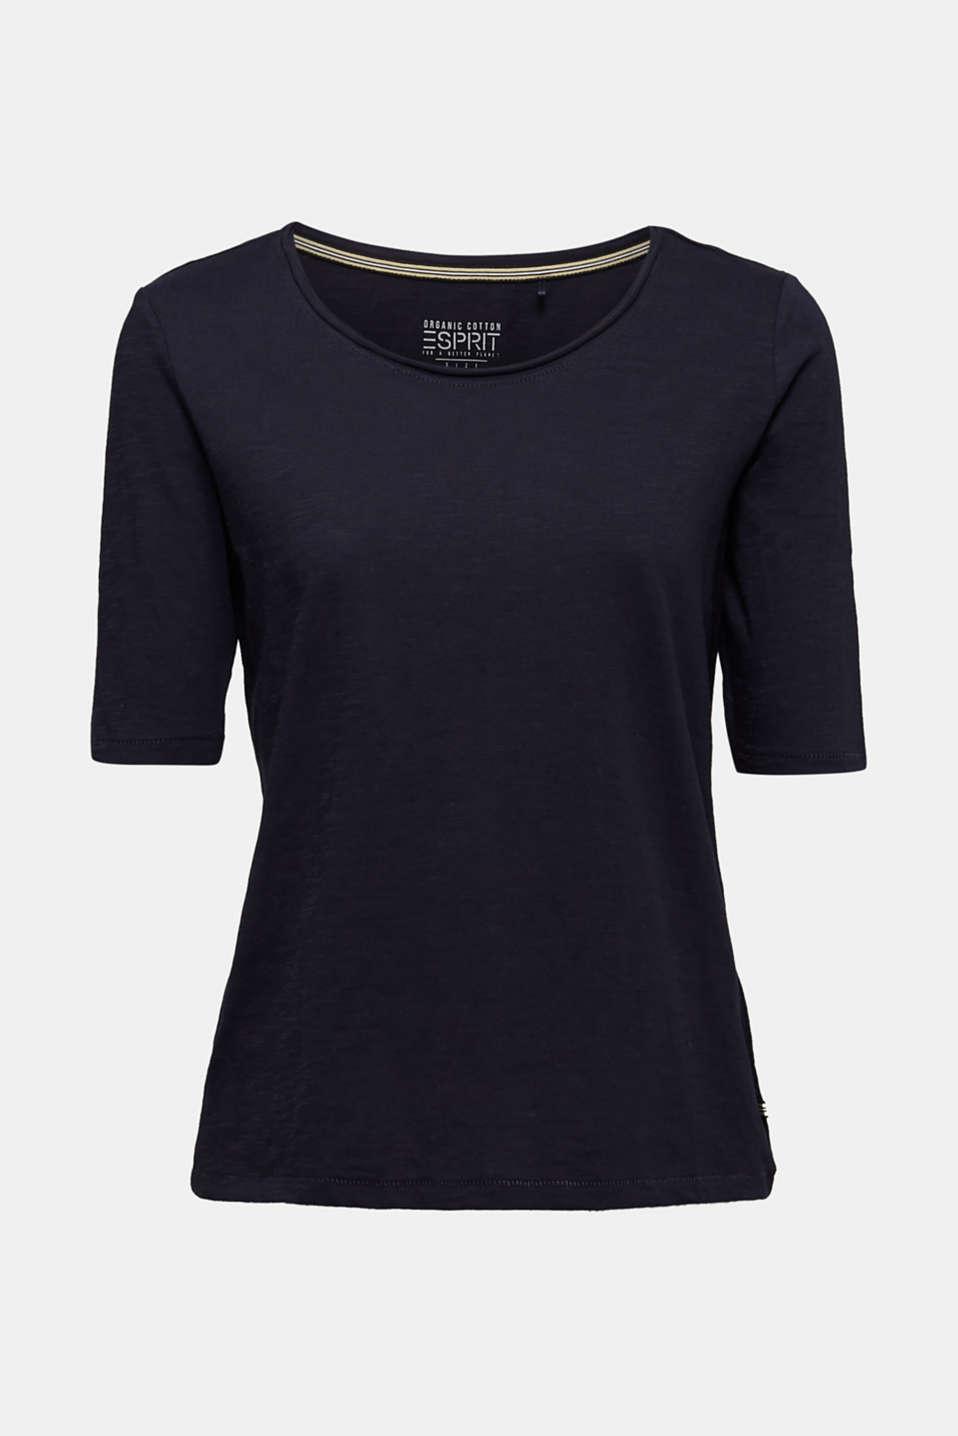 T-shirt made of 100% organic cotton, NAVY, detail image number 5